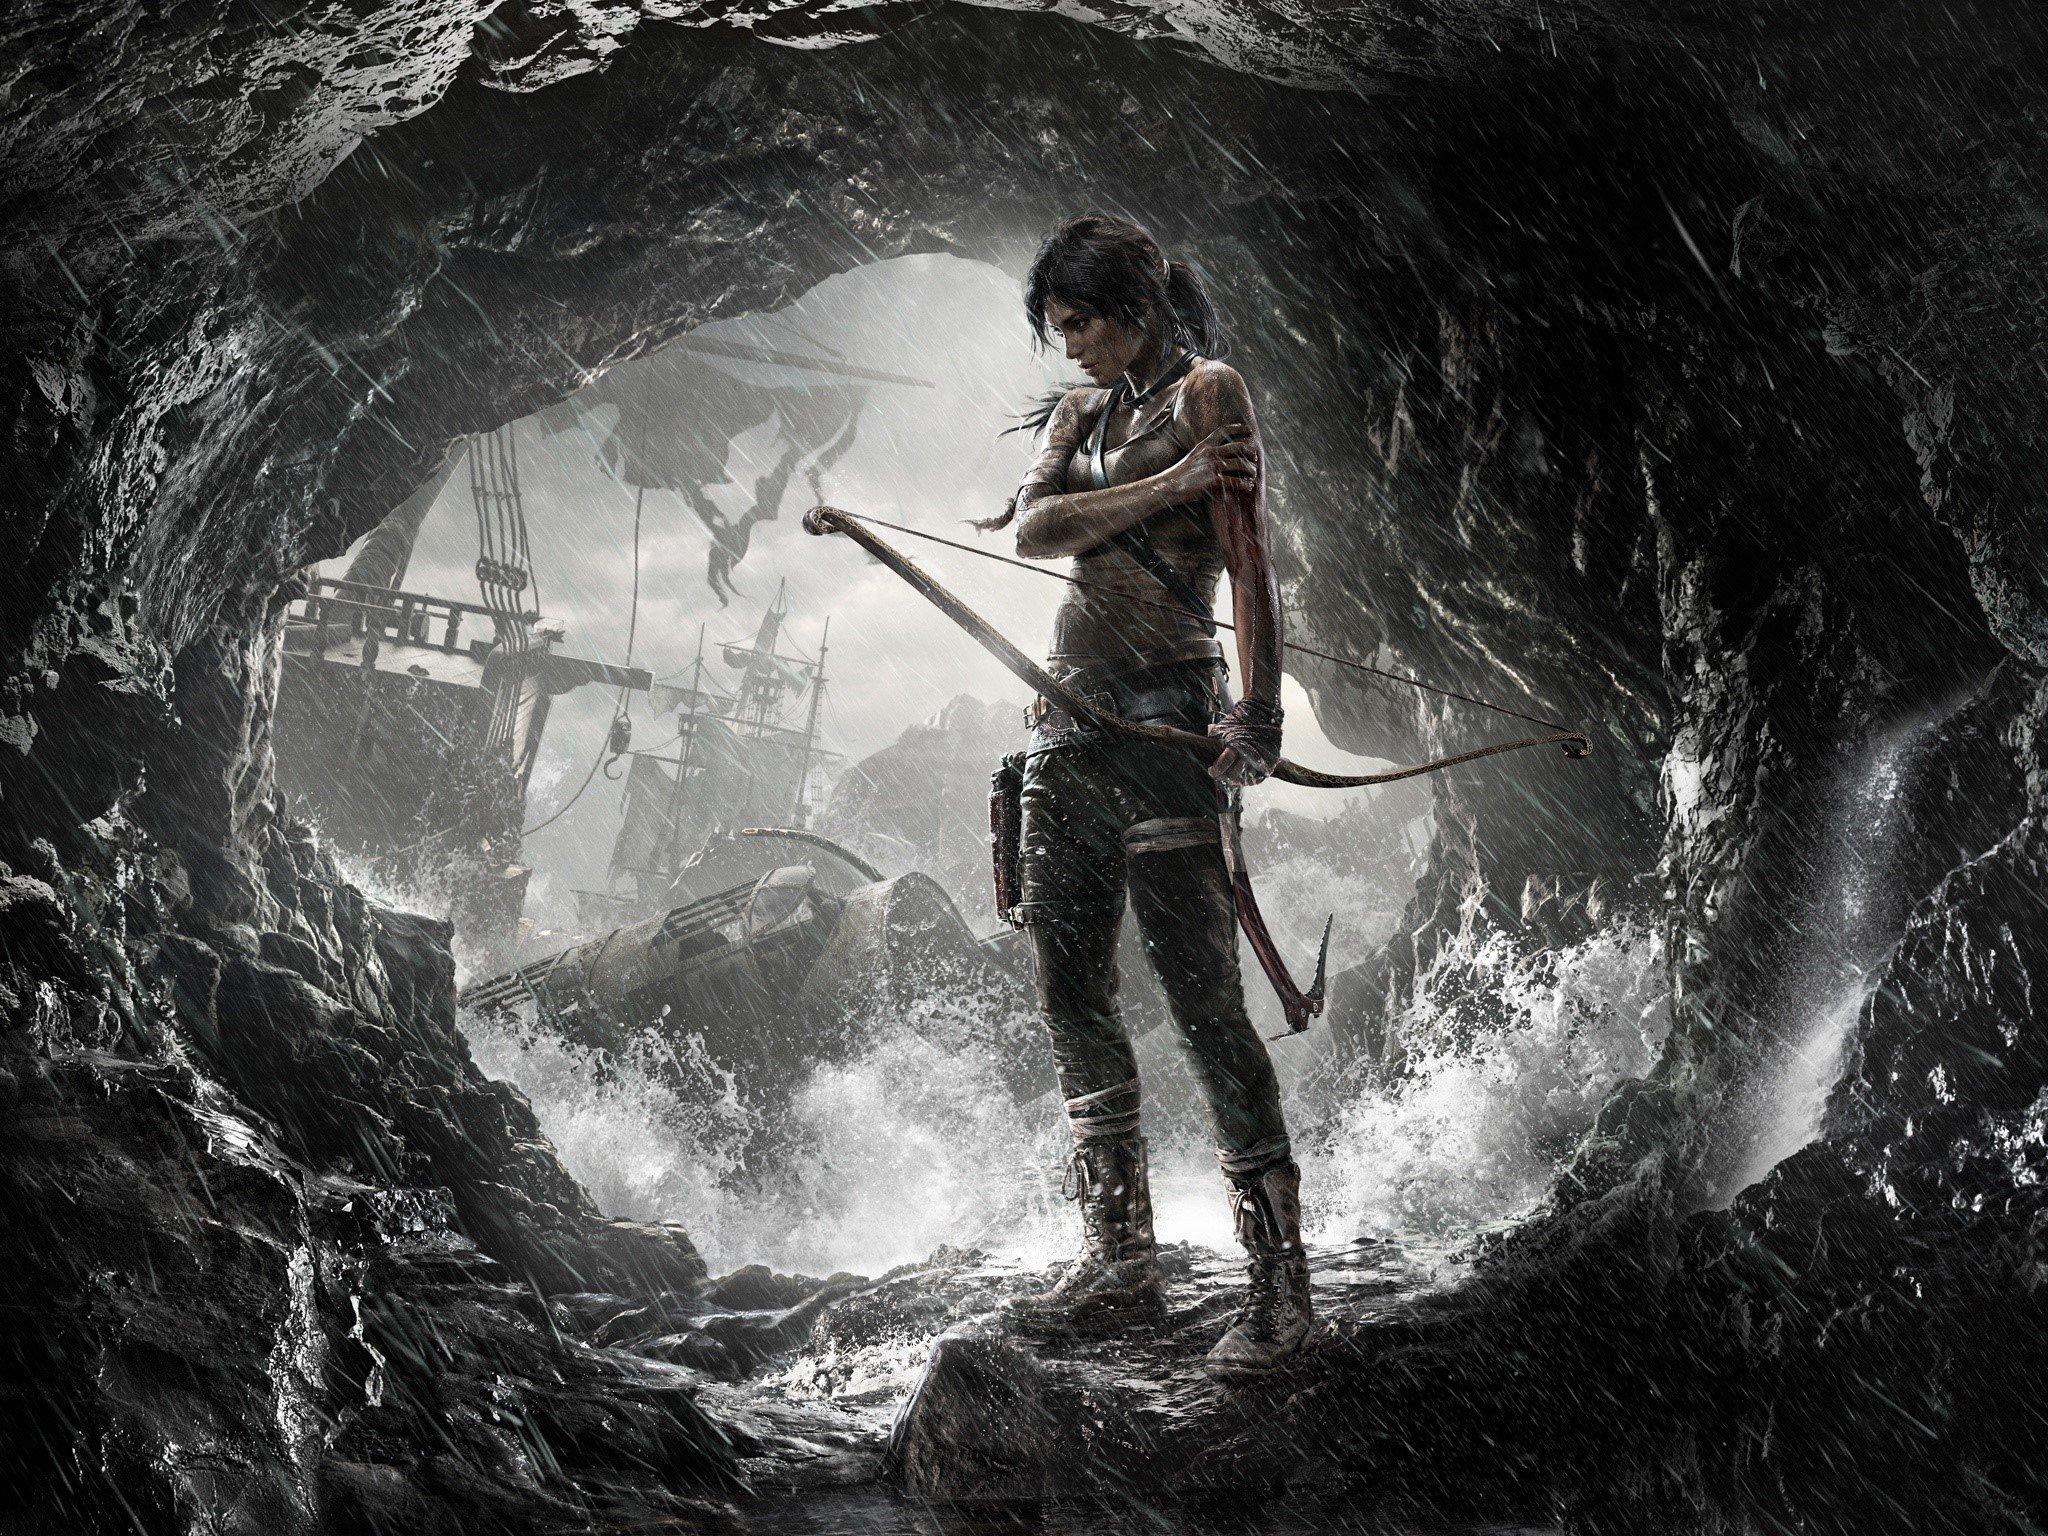 Wallpaper Game Tomb raider